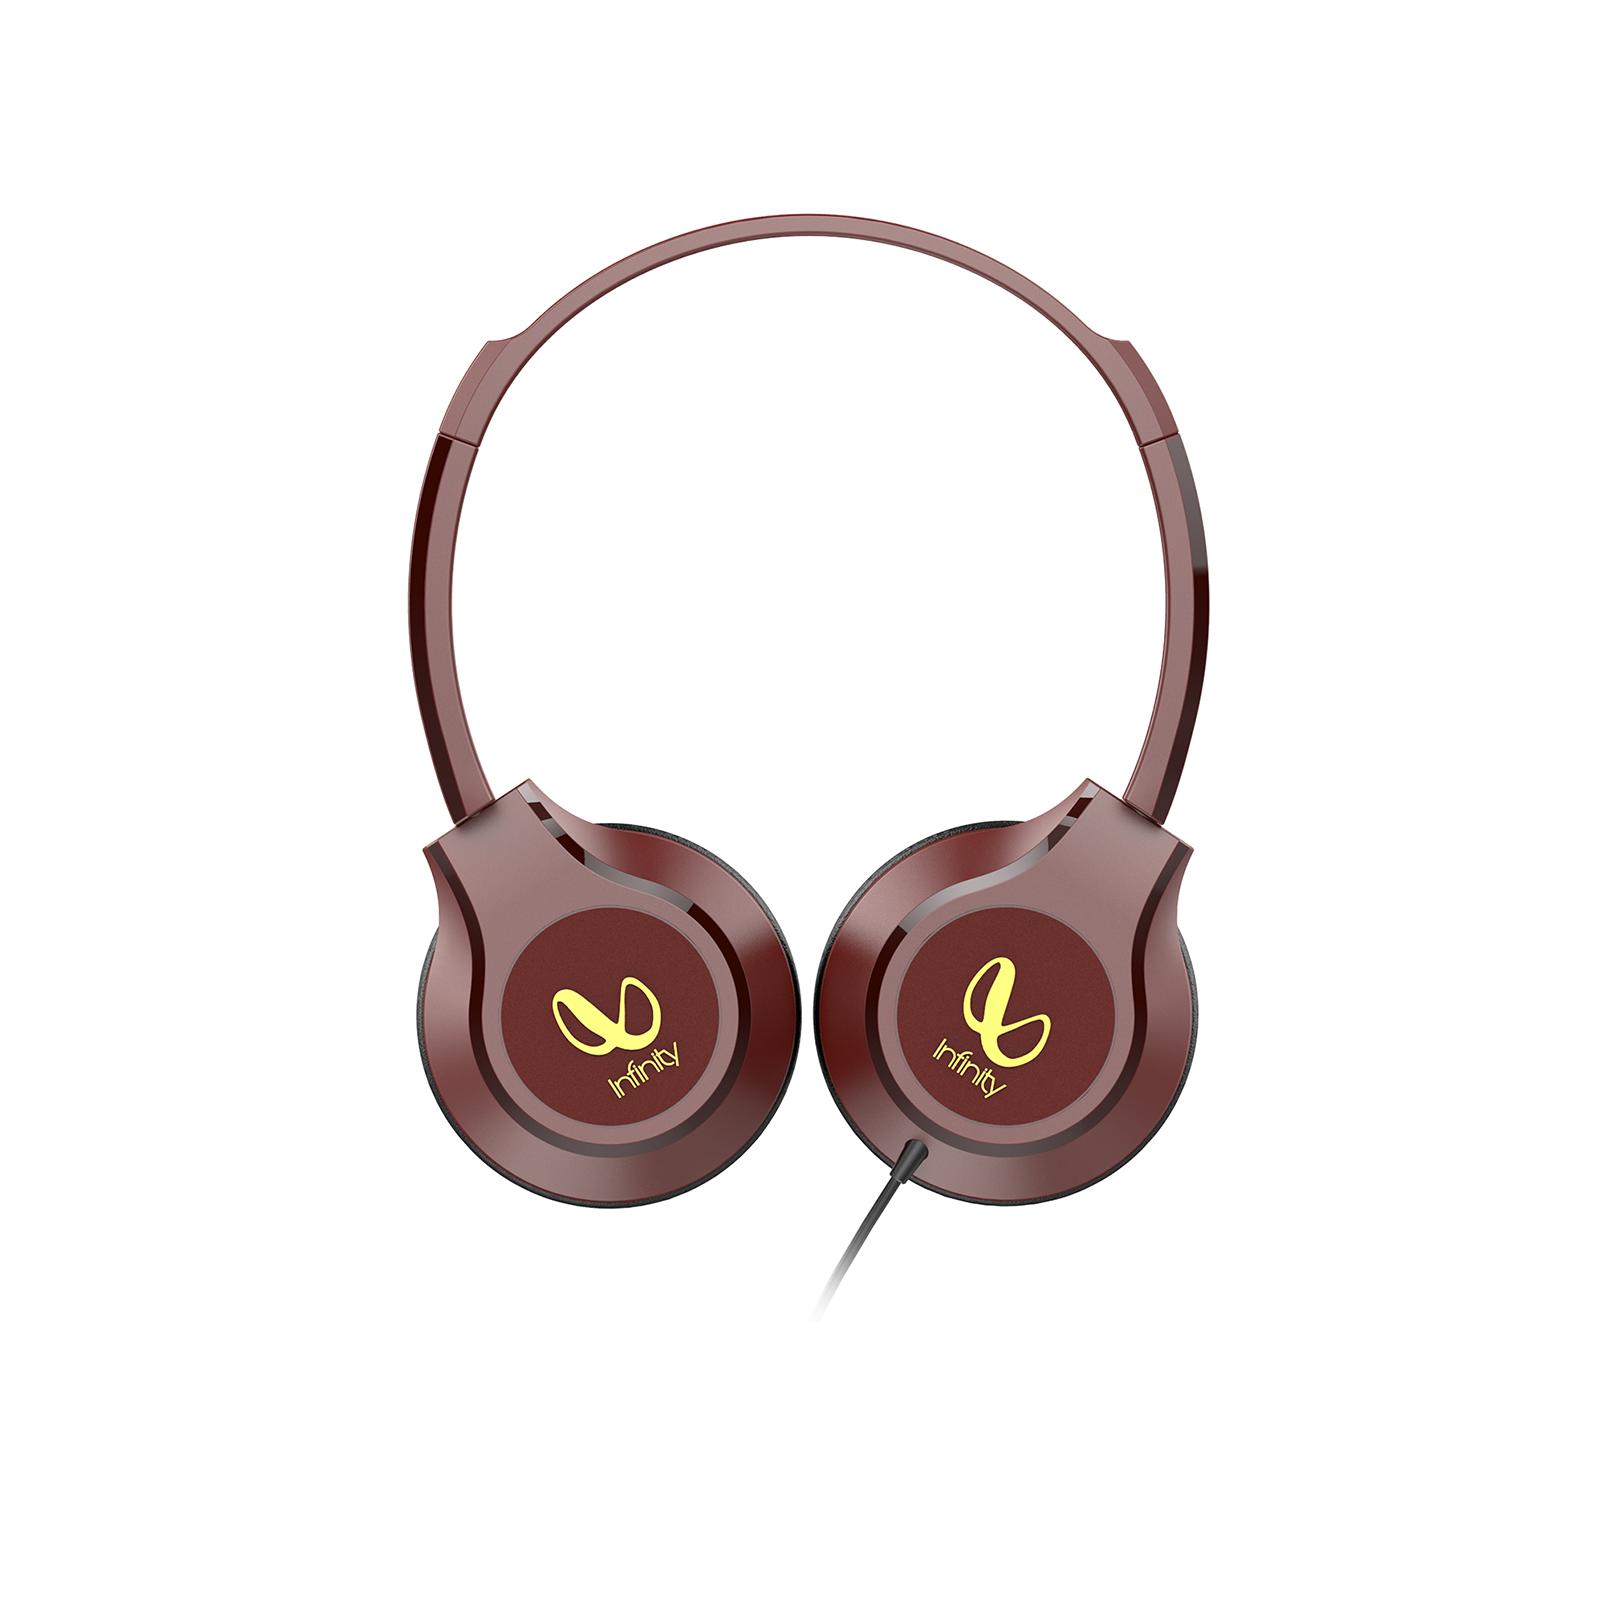 INFINITY ZIP 500 - Red - On-Ear Wired Headphones - Left